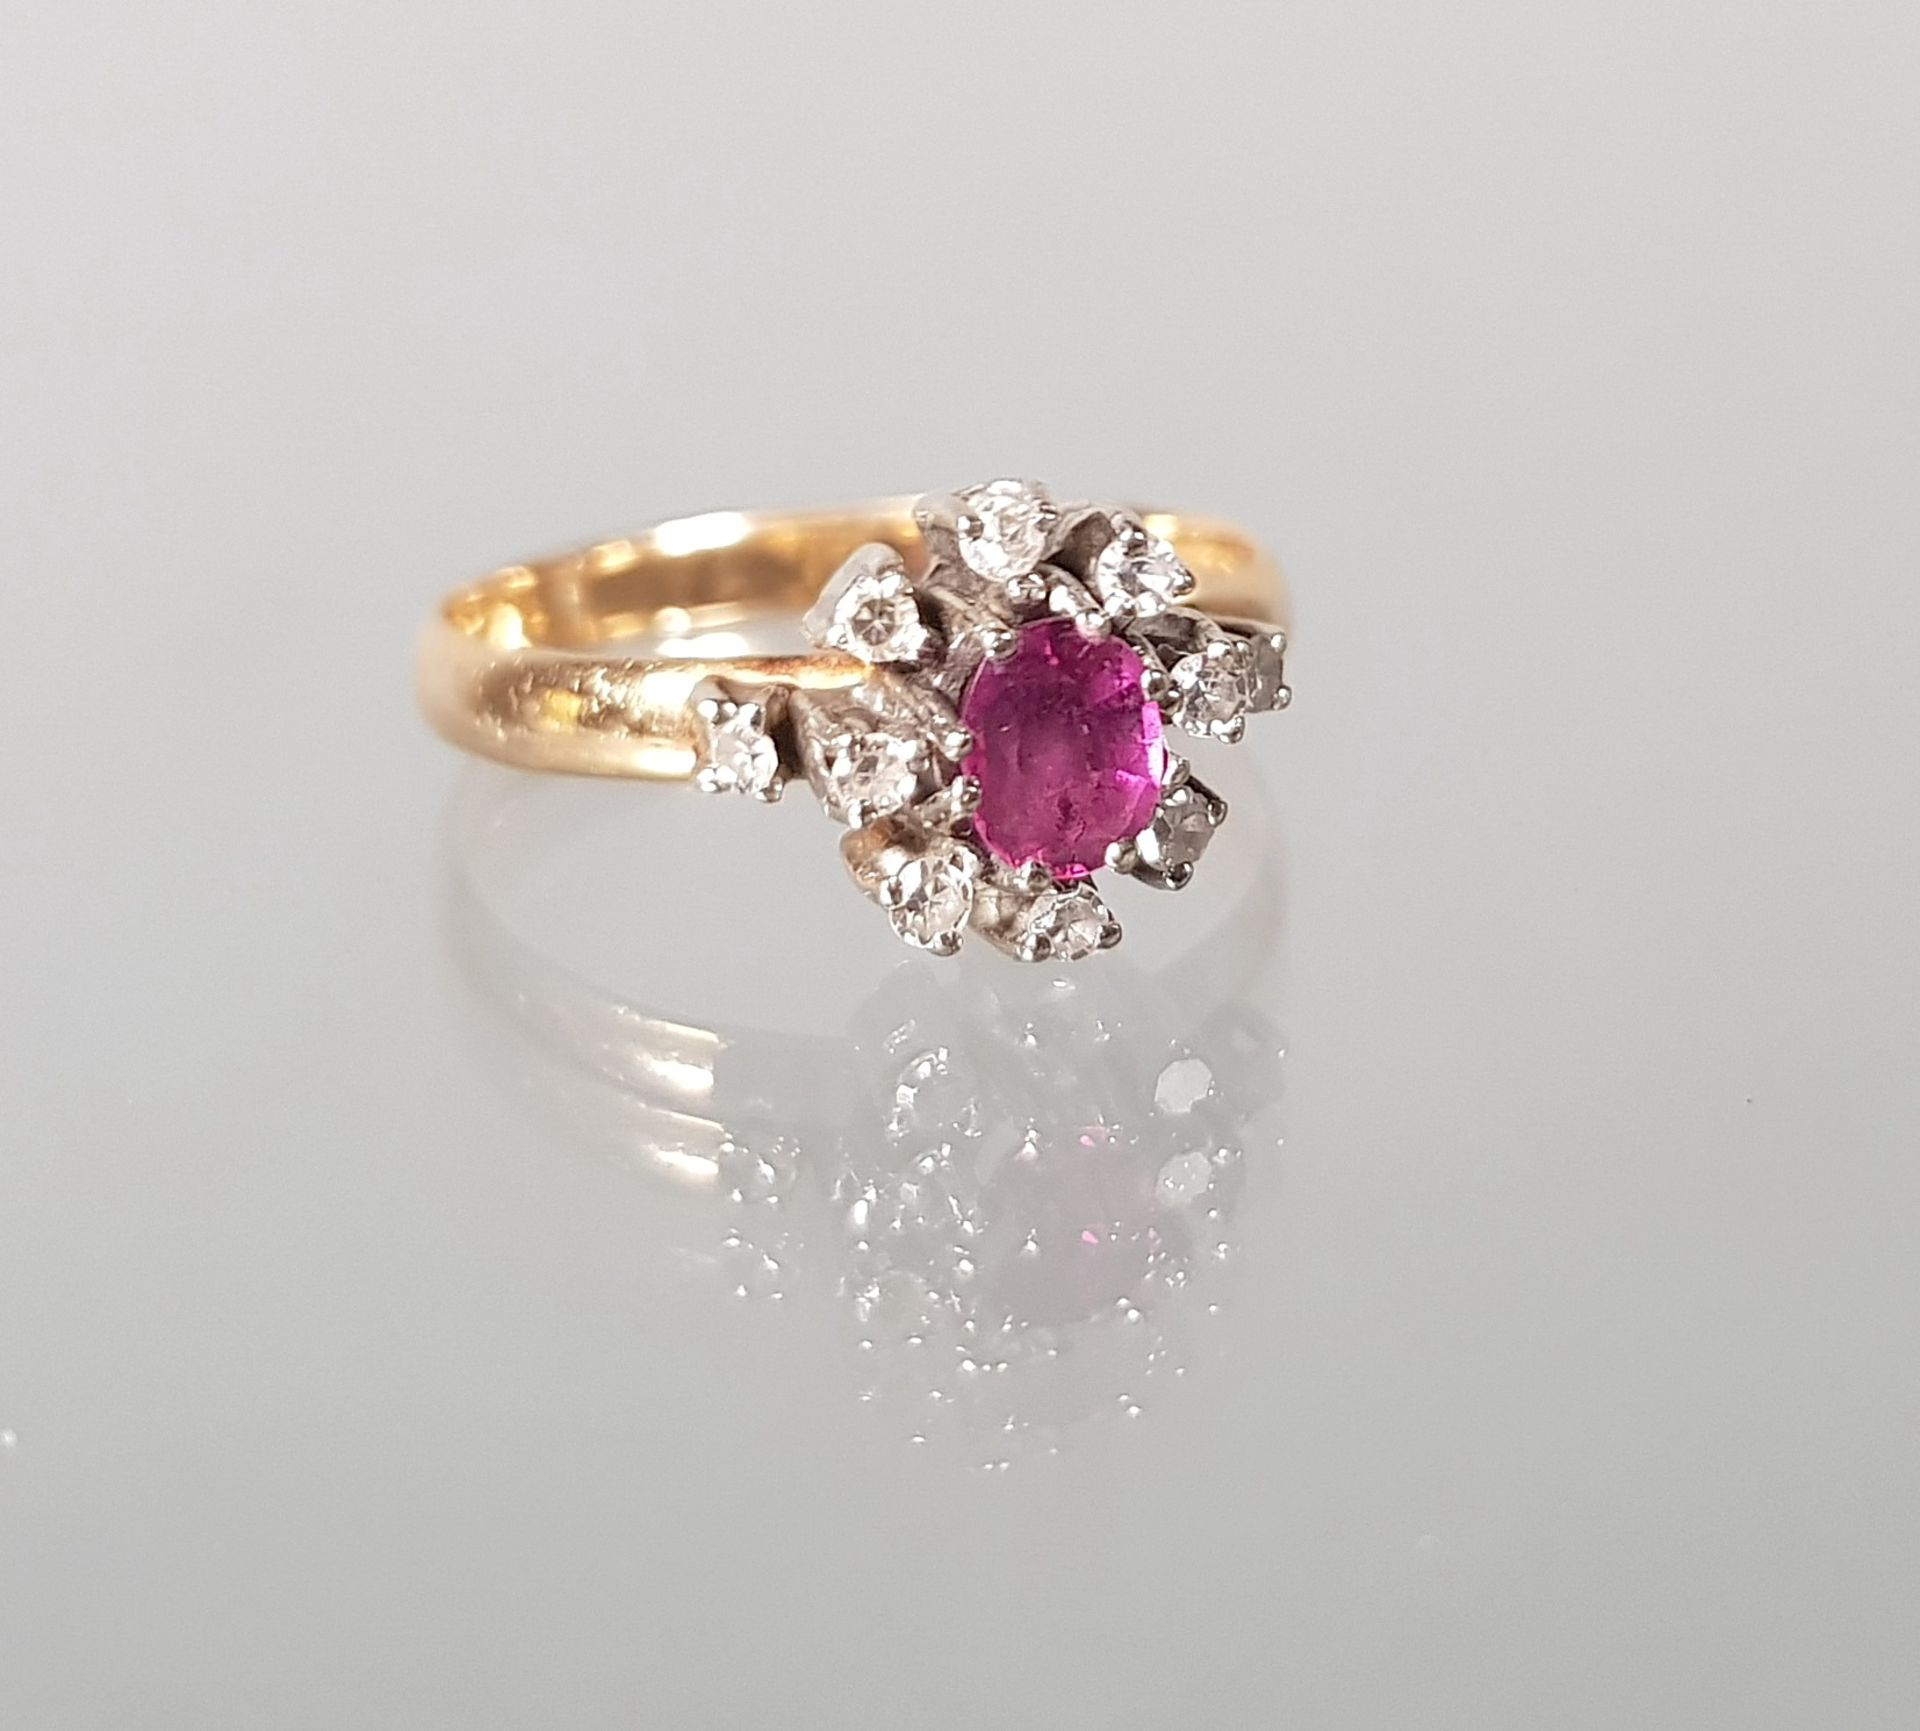 Ring, GG 750, 1 ovaler facettierter Rubin, 10 kleine Besatz-Diamanten, 3 g, RM 18